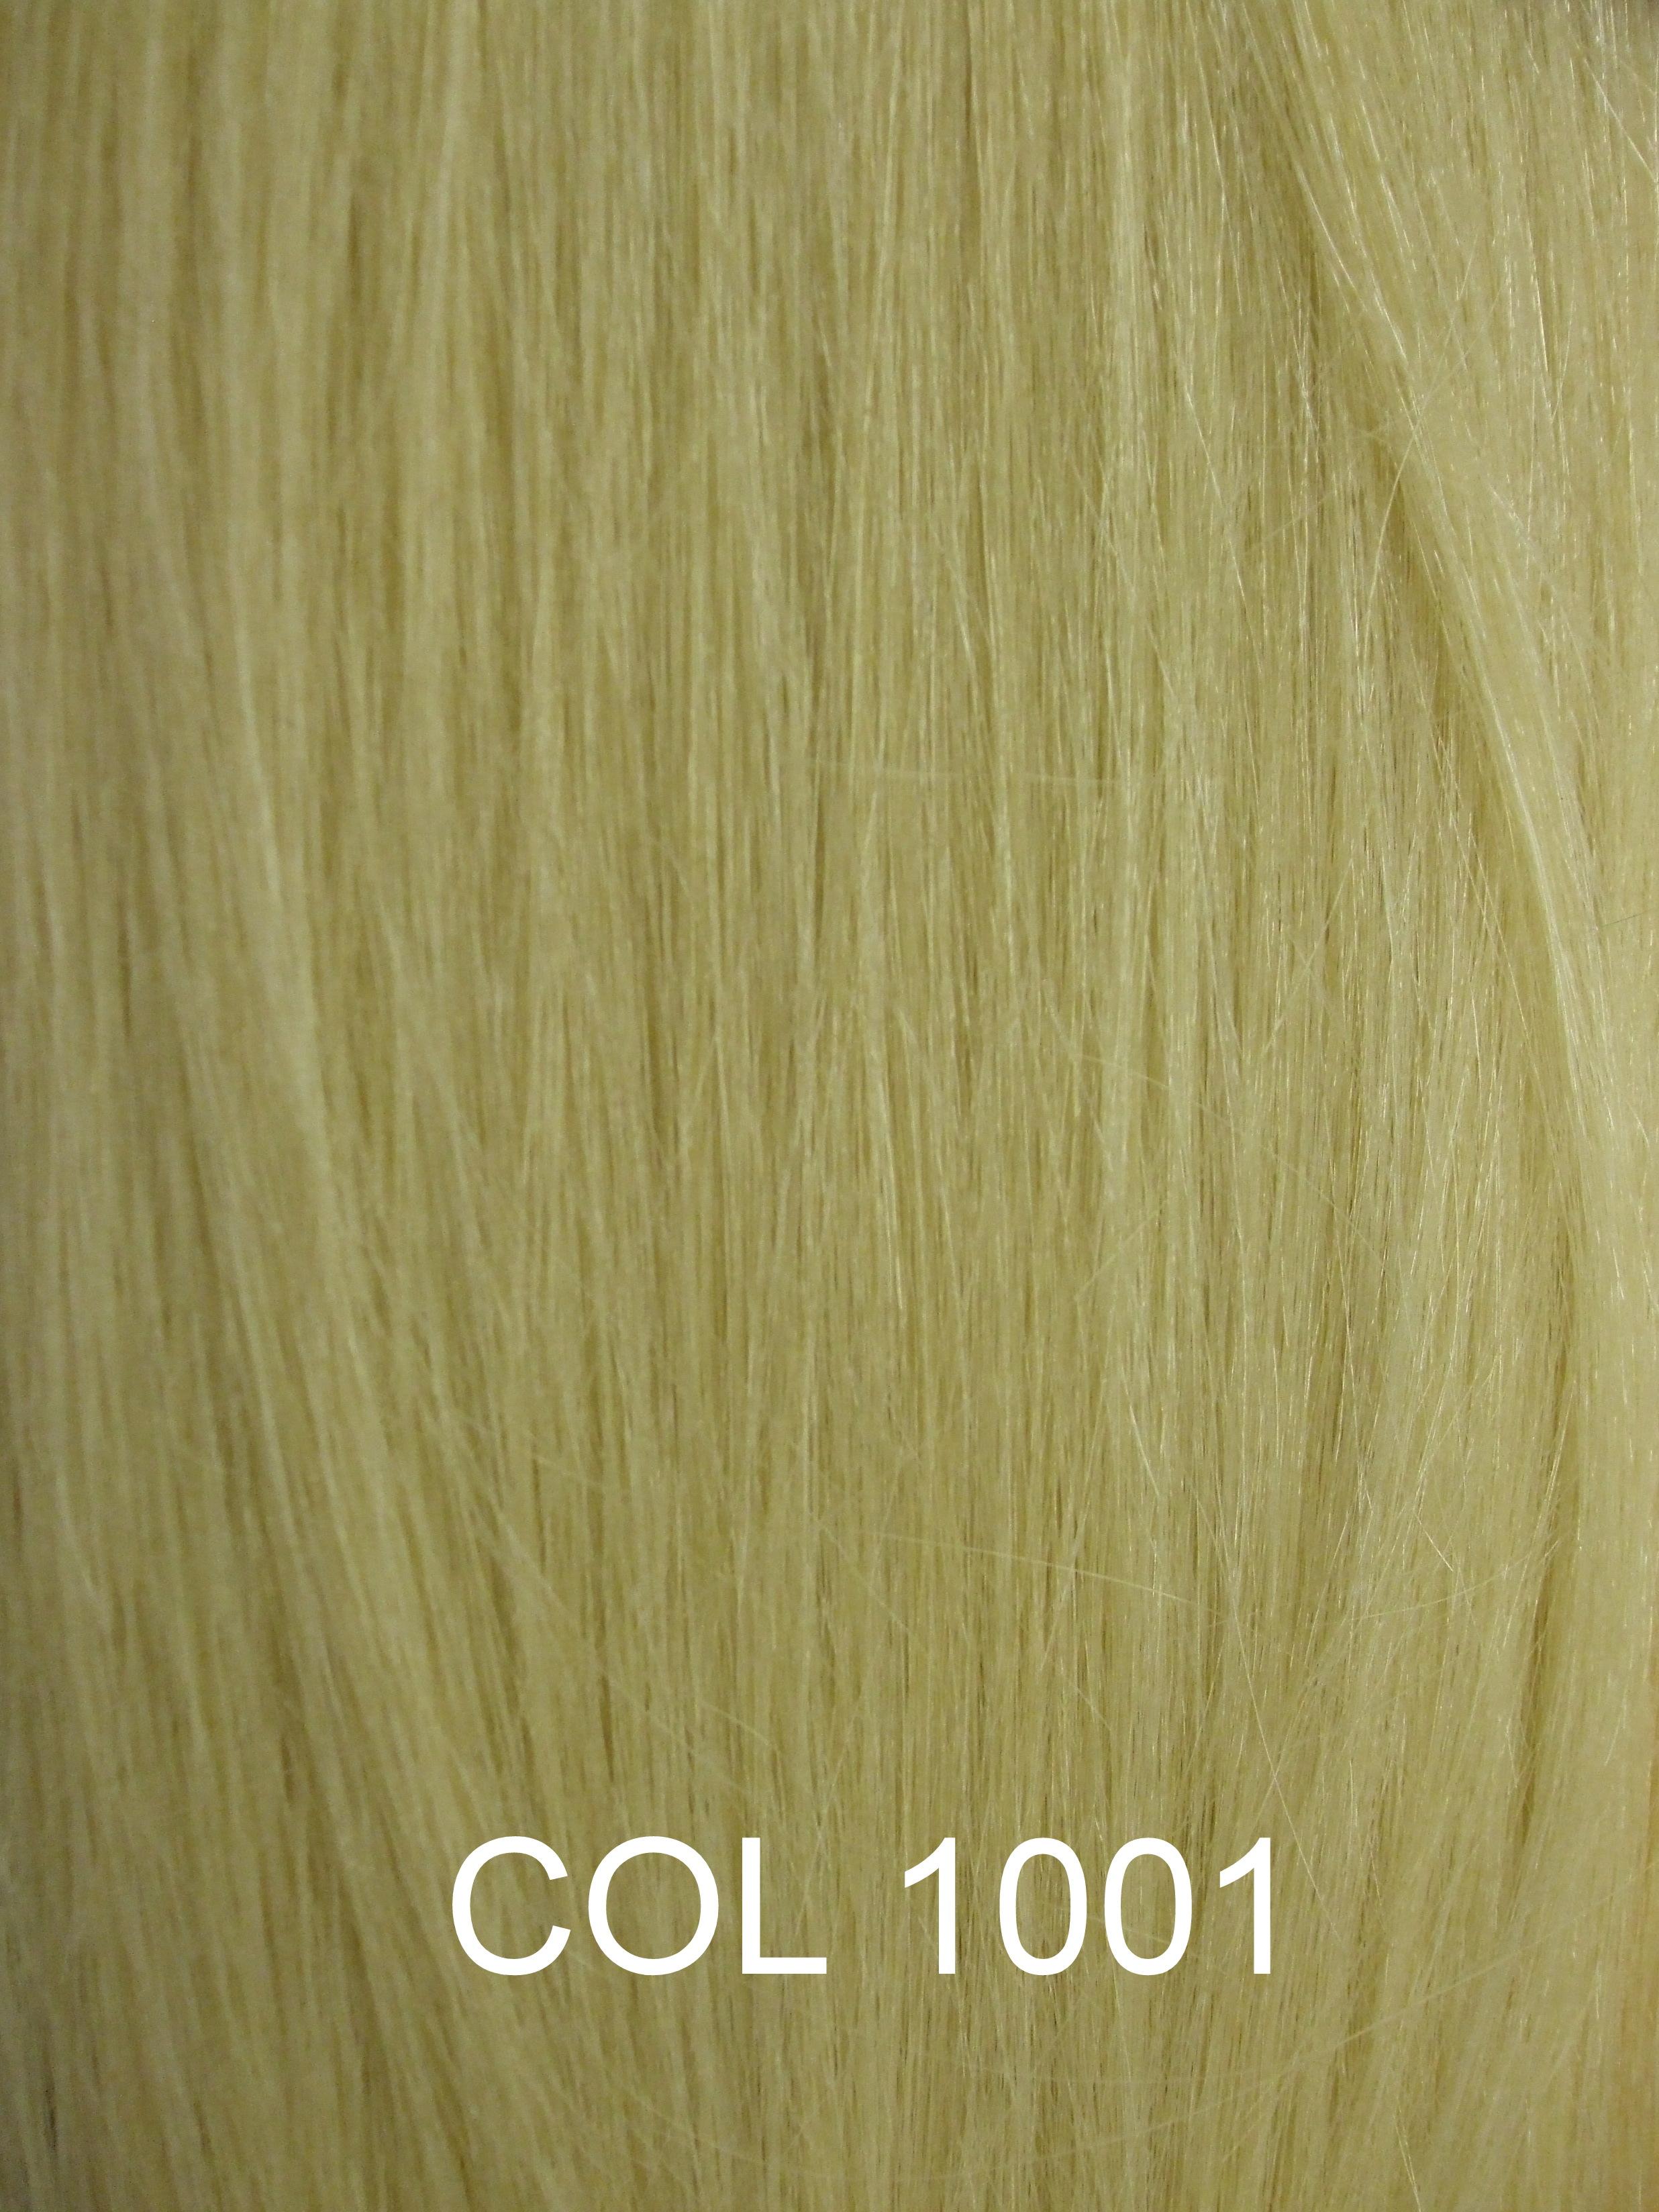 col 1001